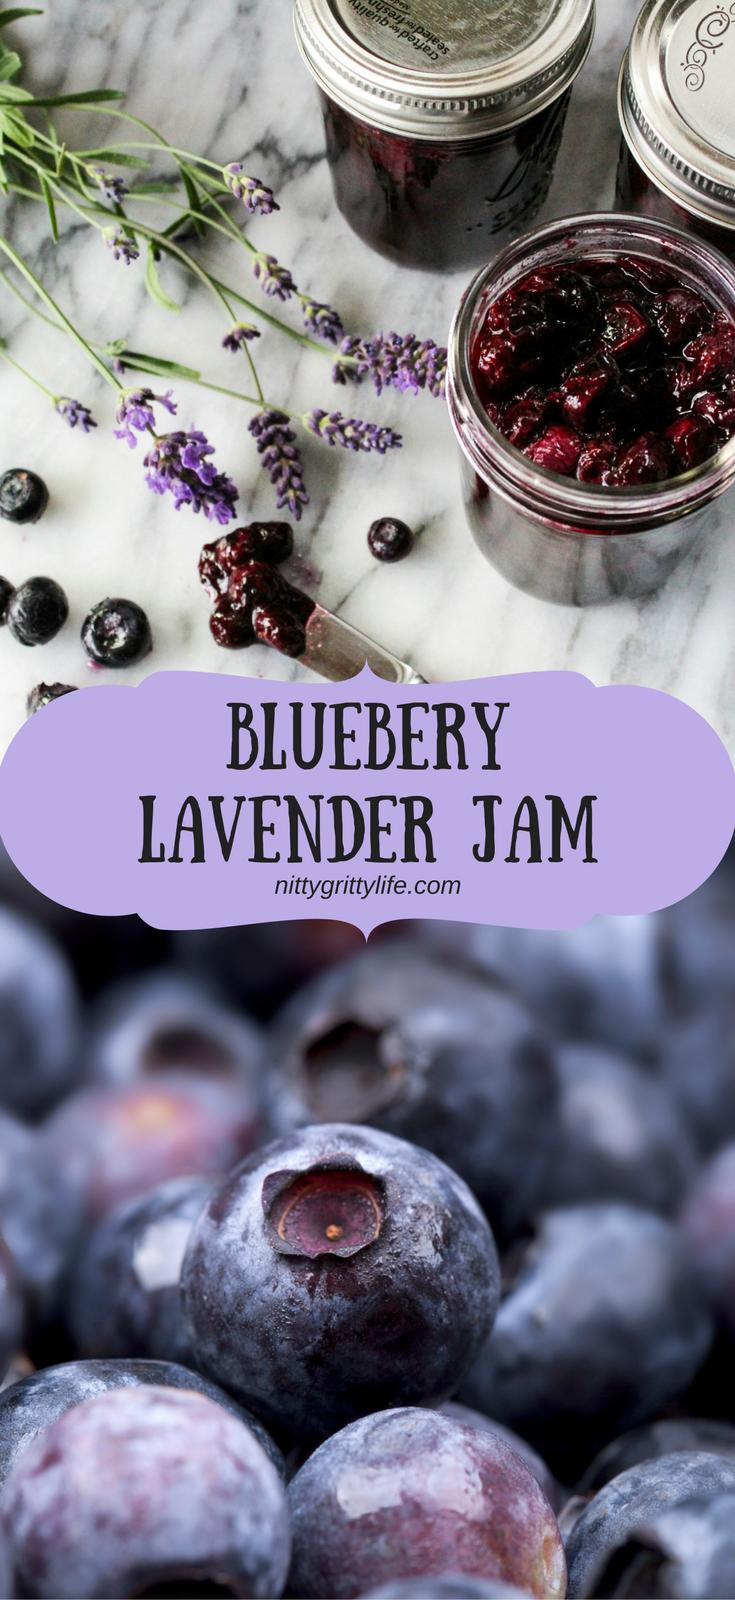 Fruit & Flowers: Blueberry Lavender Jam | Inspiration